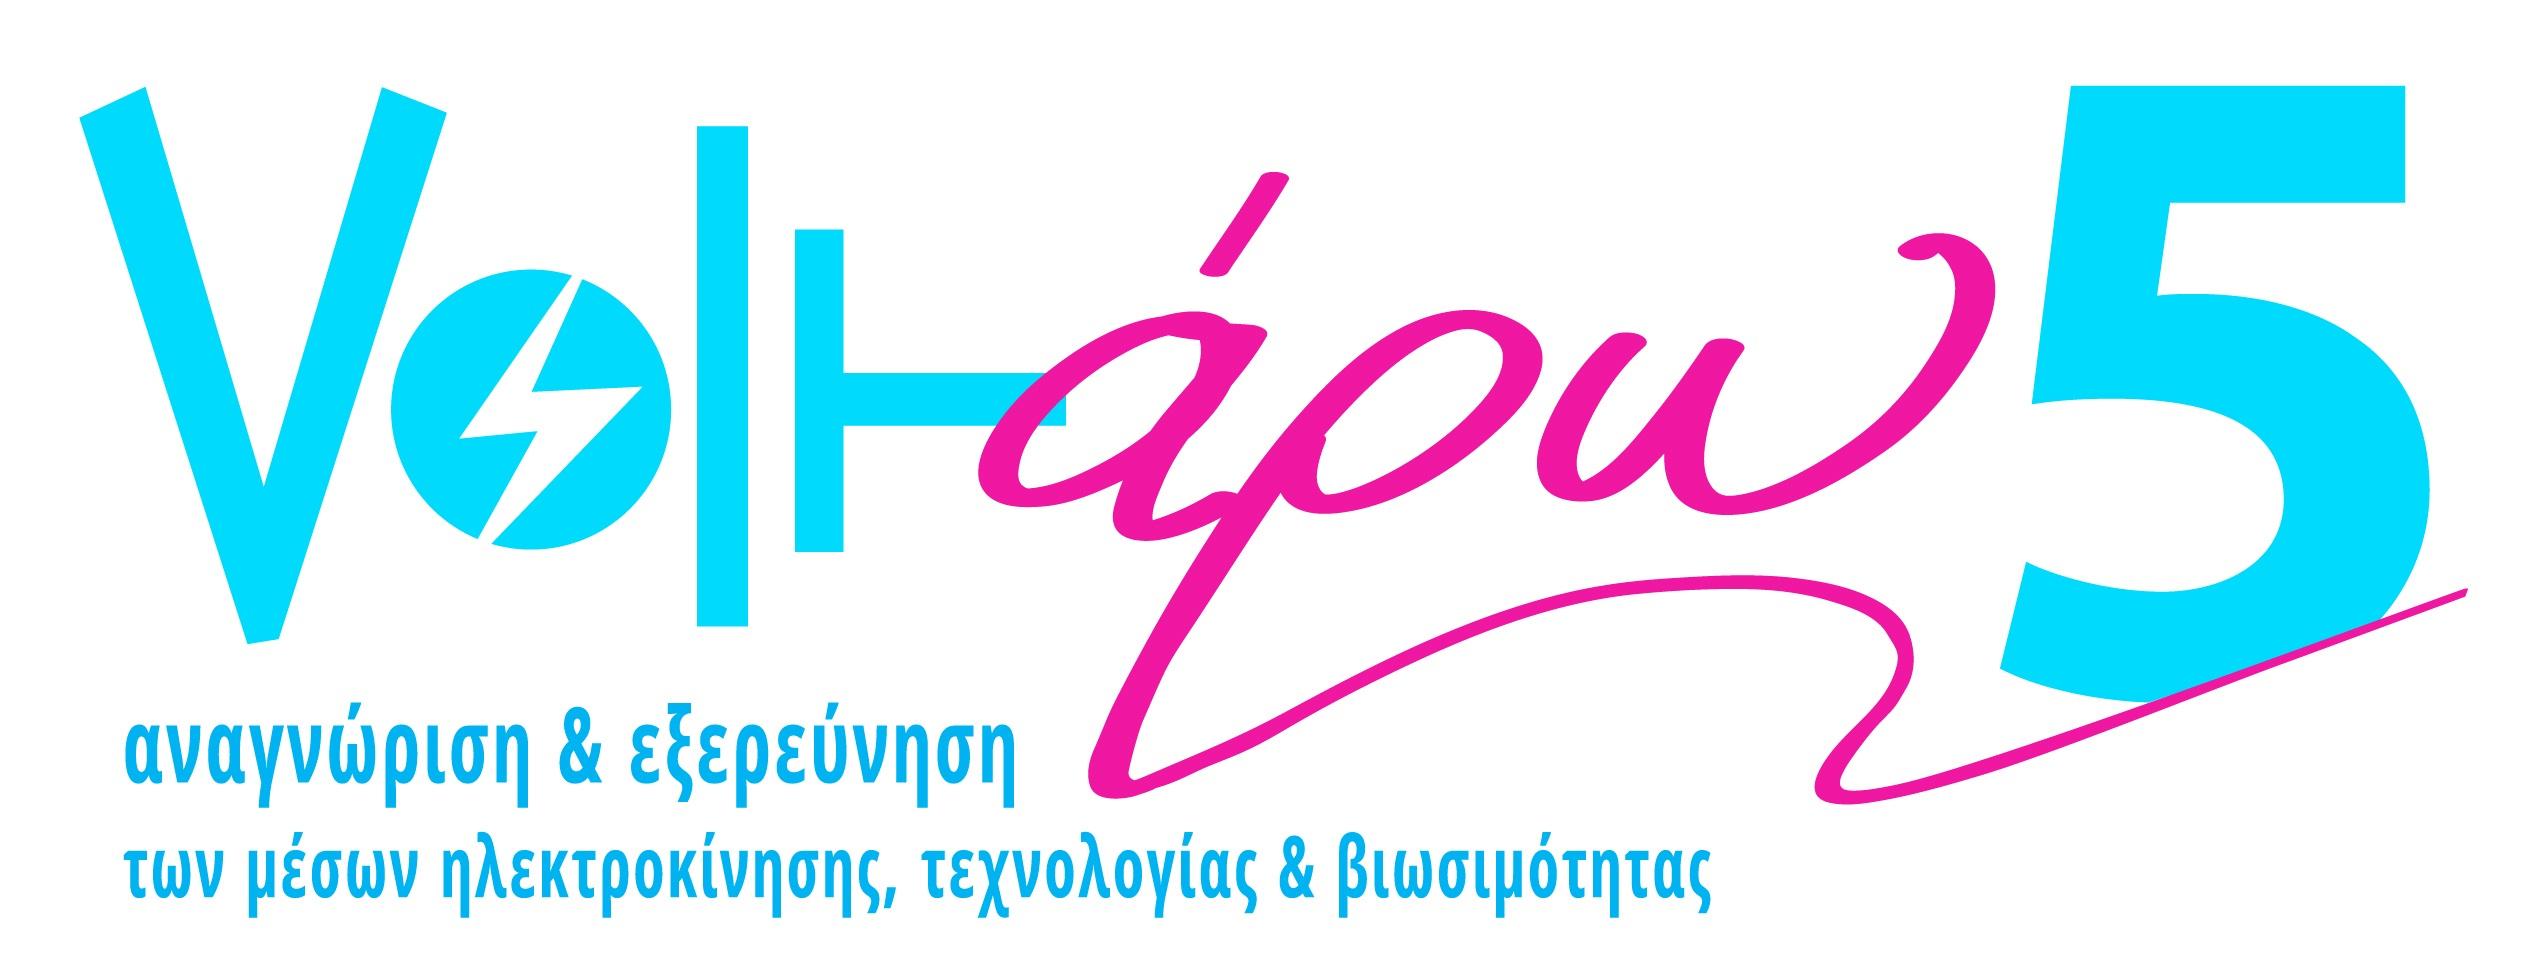 «Voltάρω 5», η «πράσινη» γιορτή της ΠΚΜ για την ηλεκτροκίνηση – Κυριακή 26 Σεπτεμβρίου 2021 στην παραλία της Θεσσαλονίκης